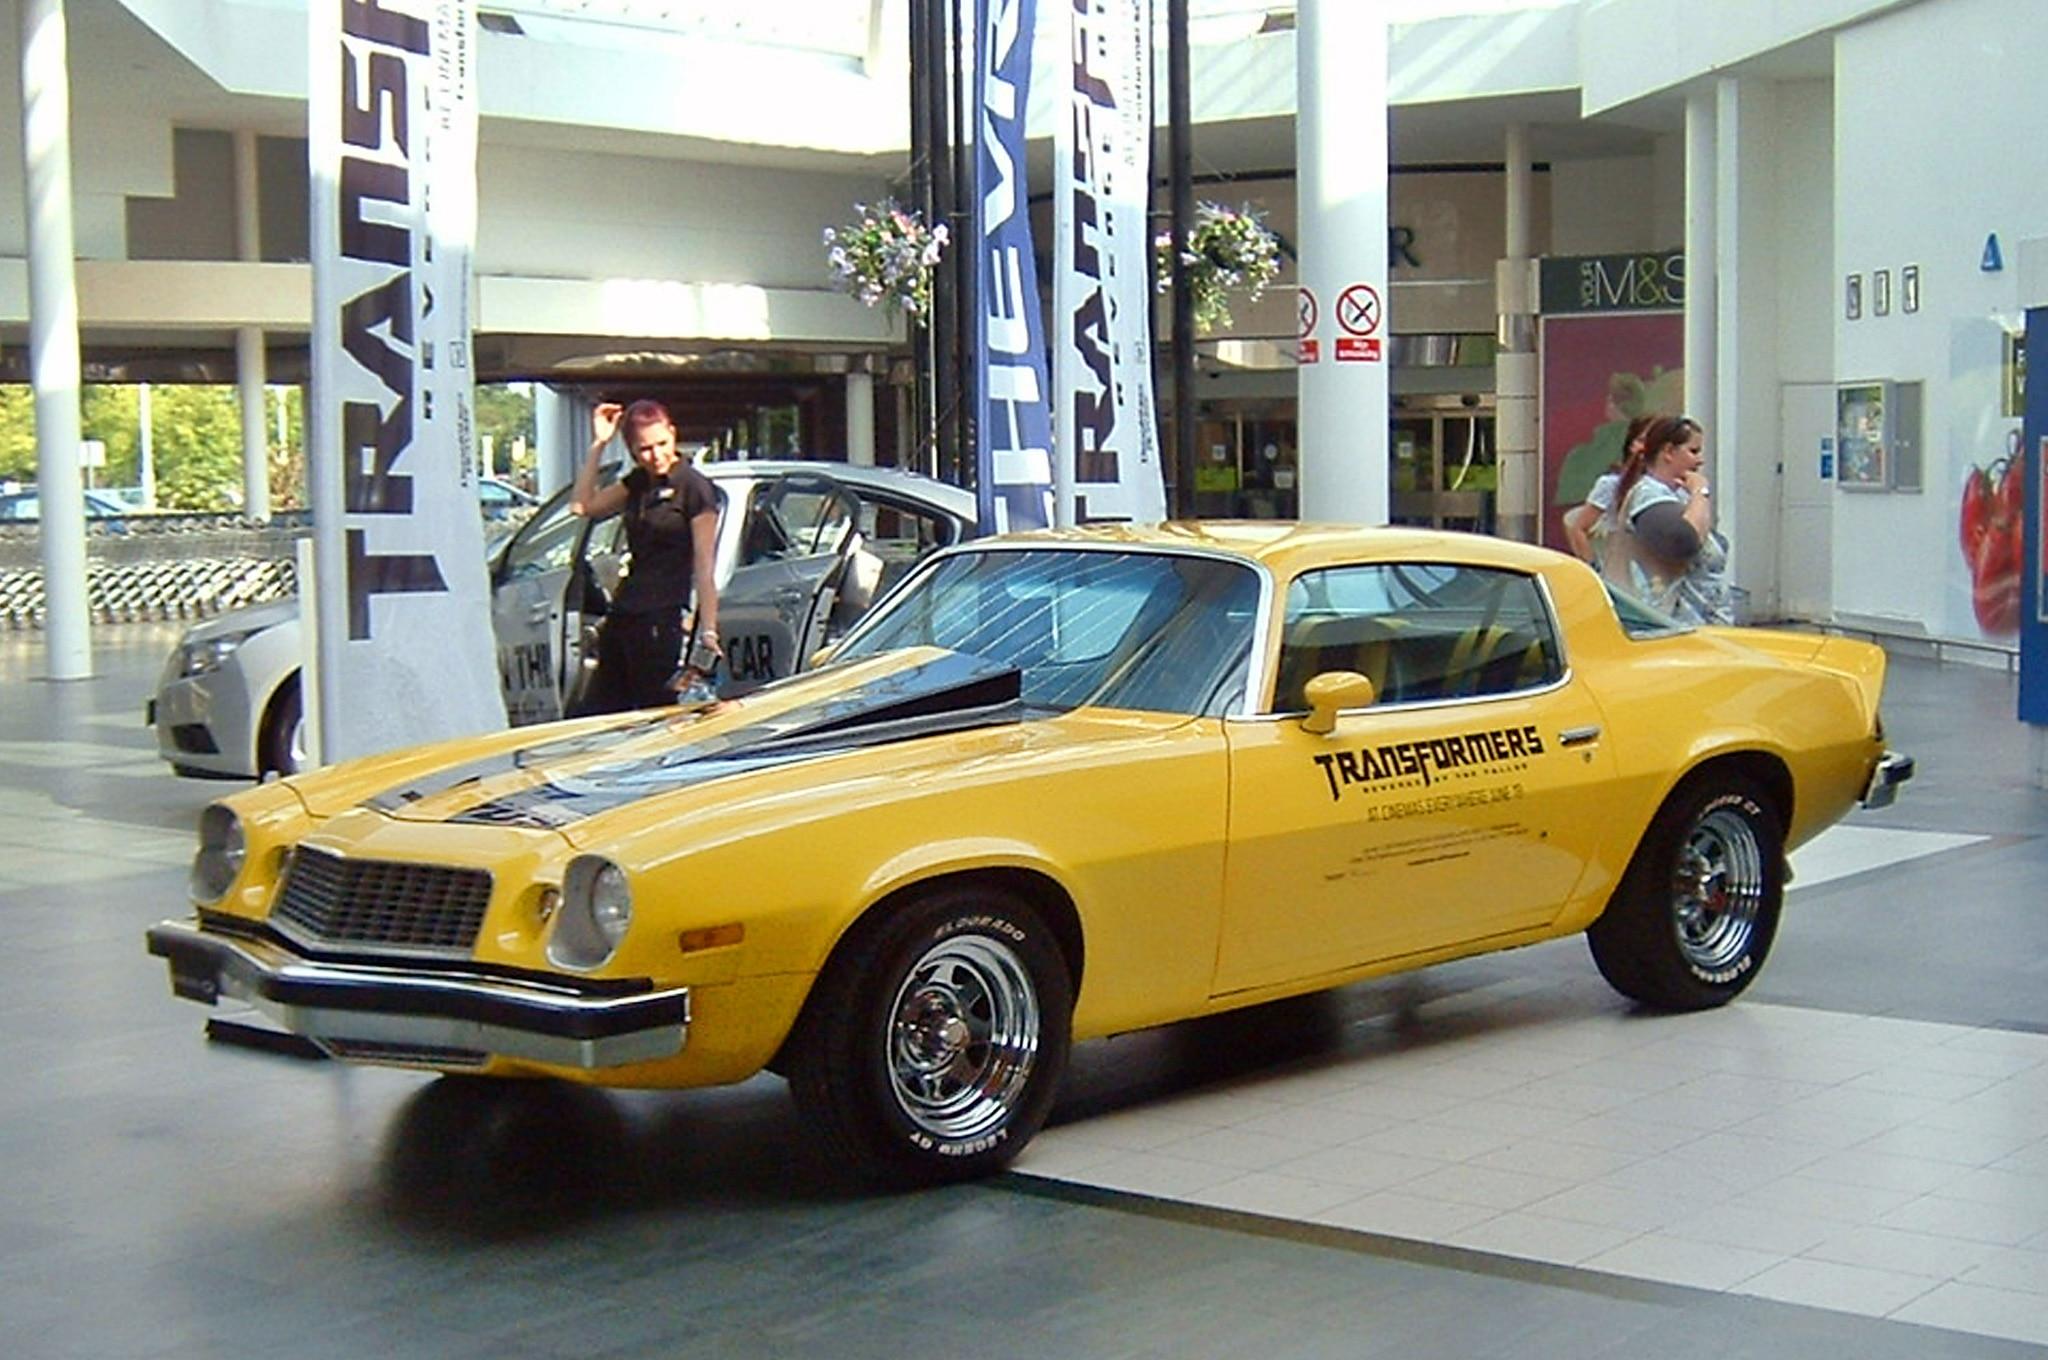 Transformers 4 Bumblebee Becomes A 1967 Chevrolet Camaro